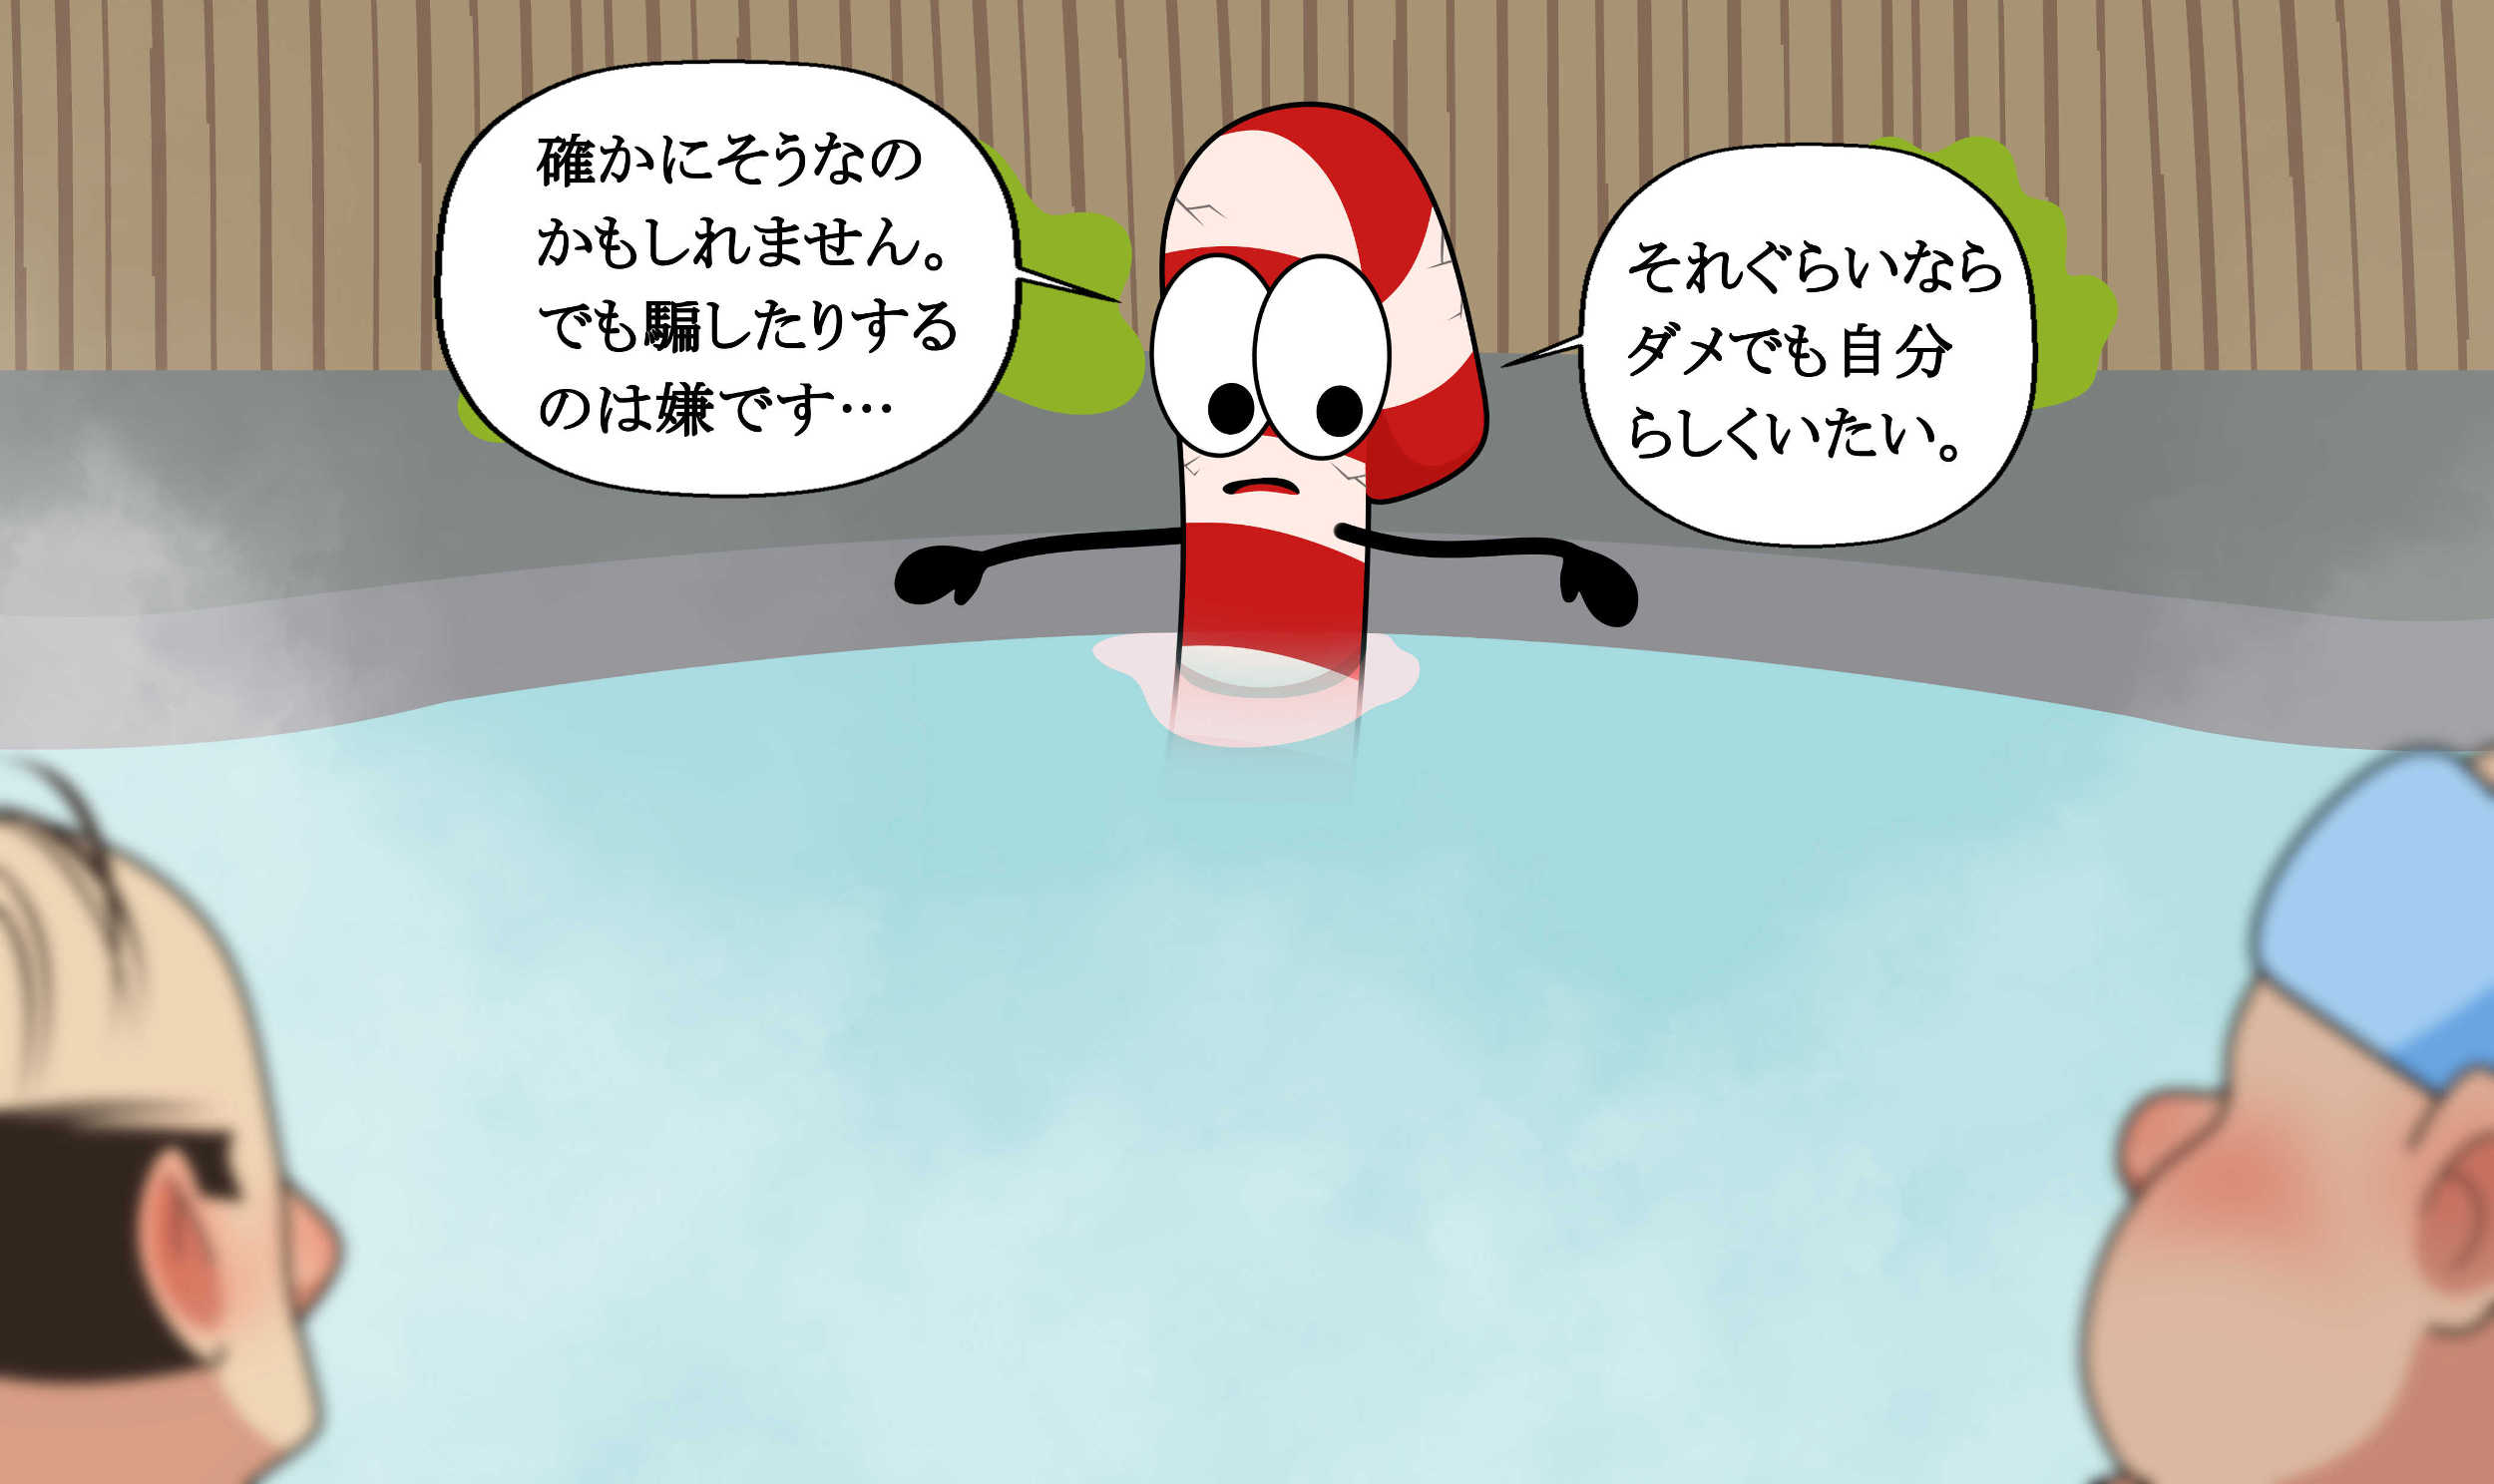 Onsen_66-min.jpg